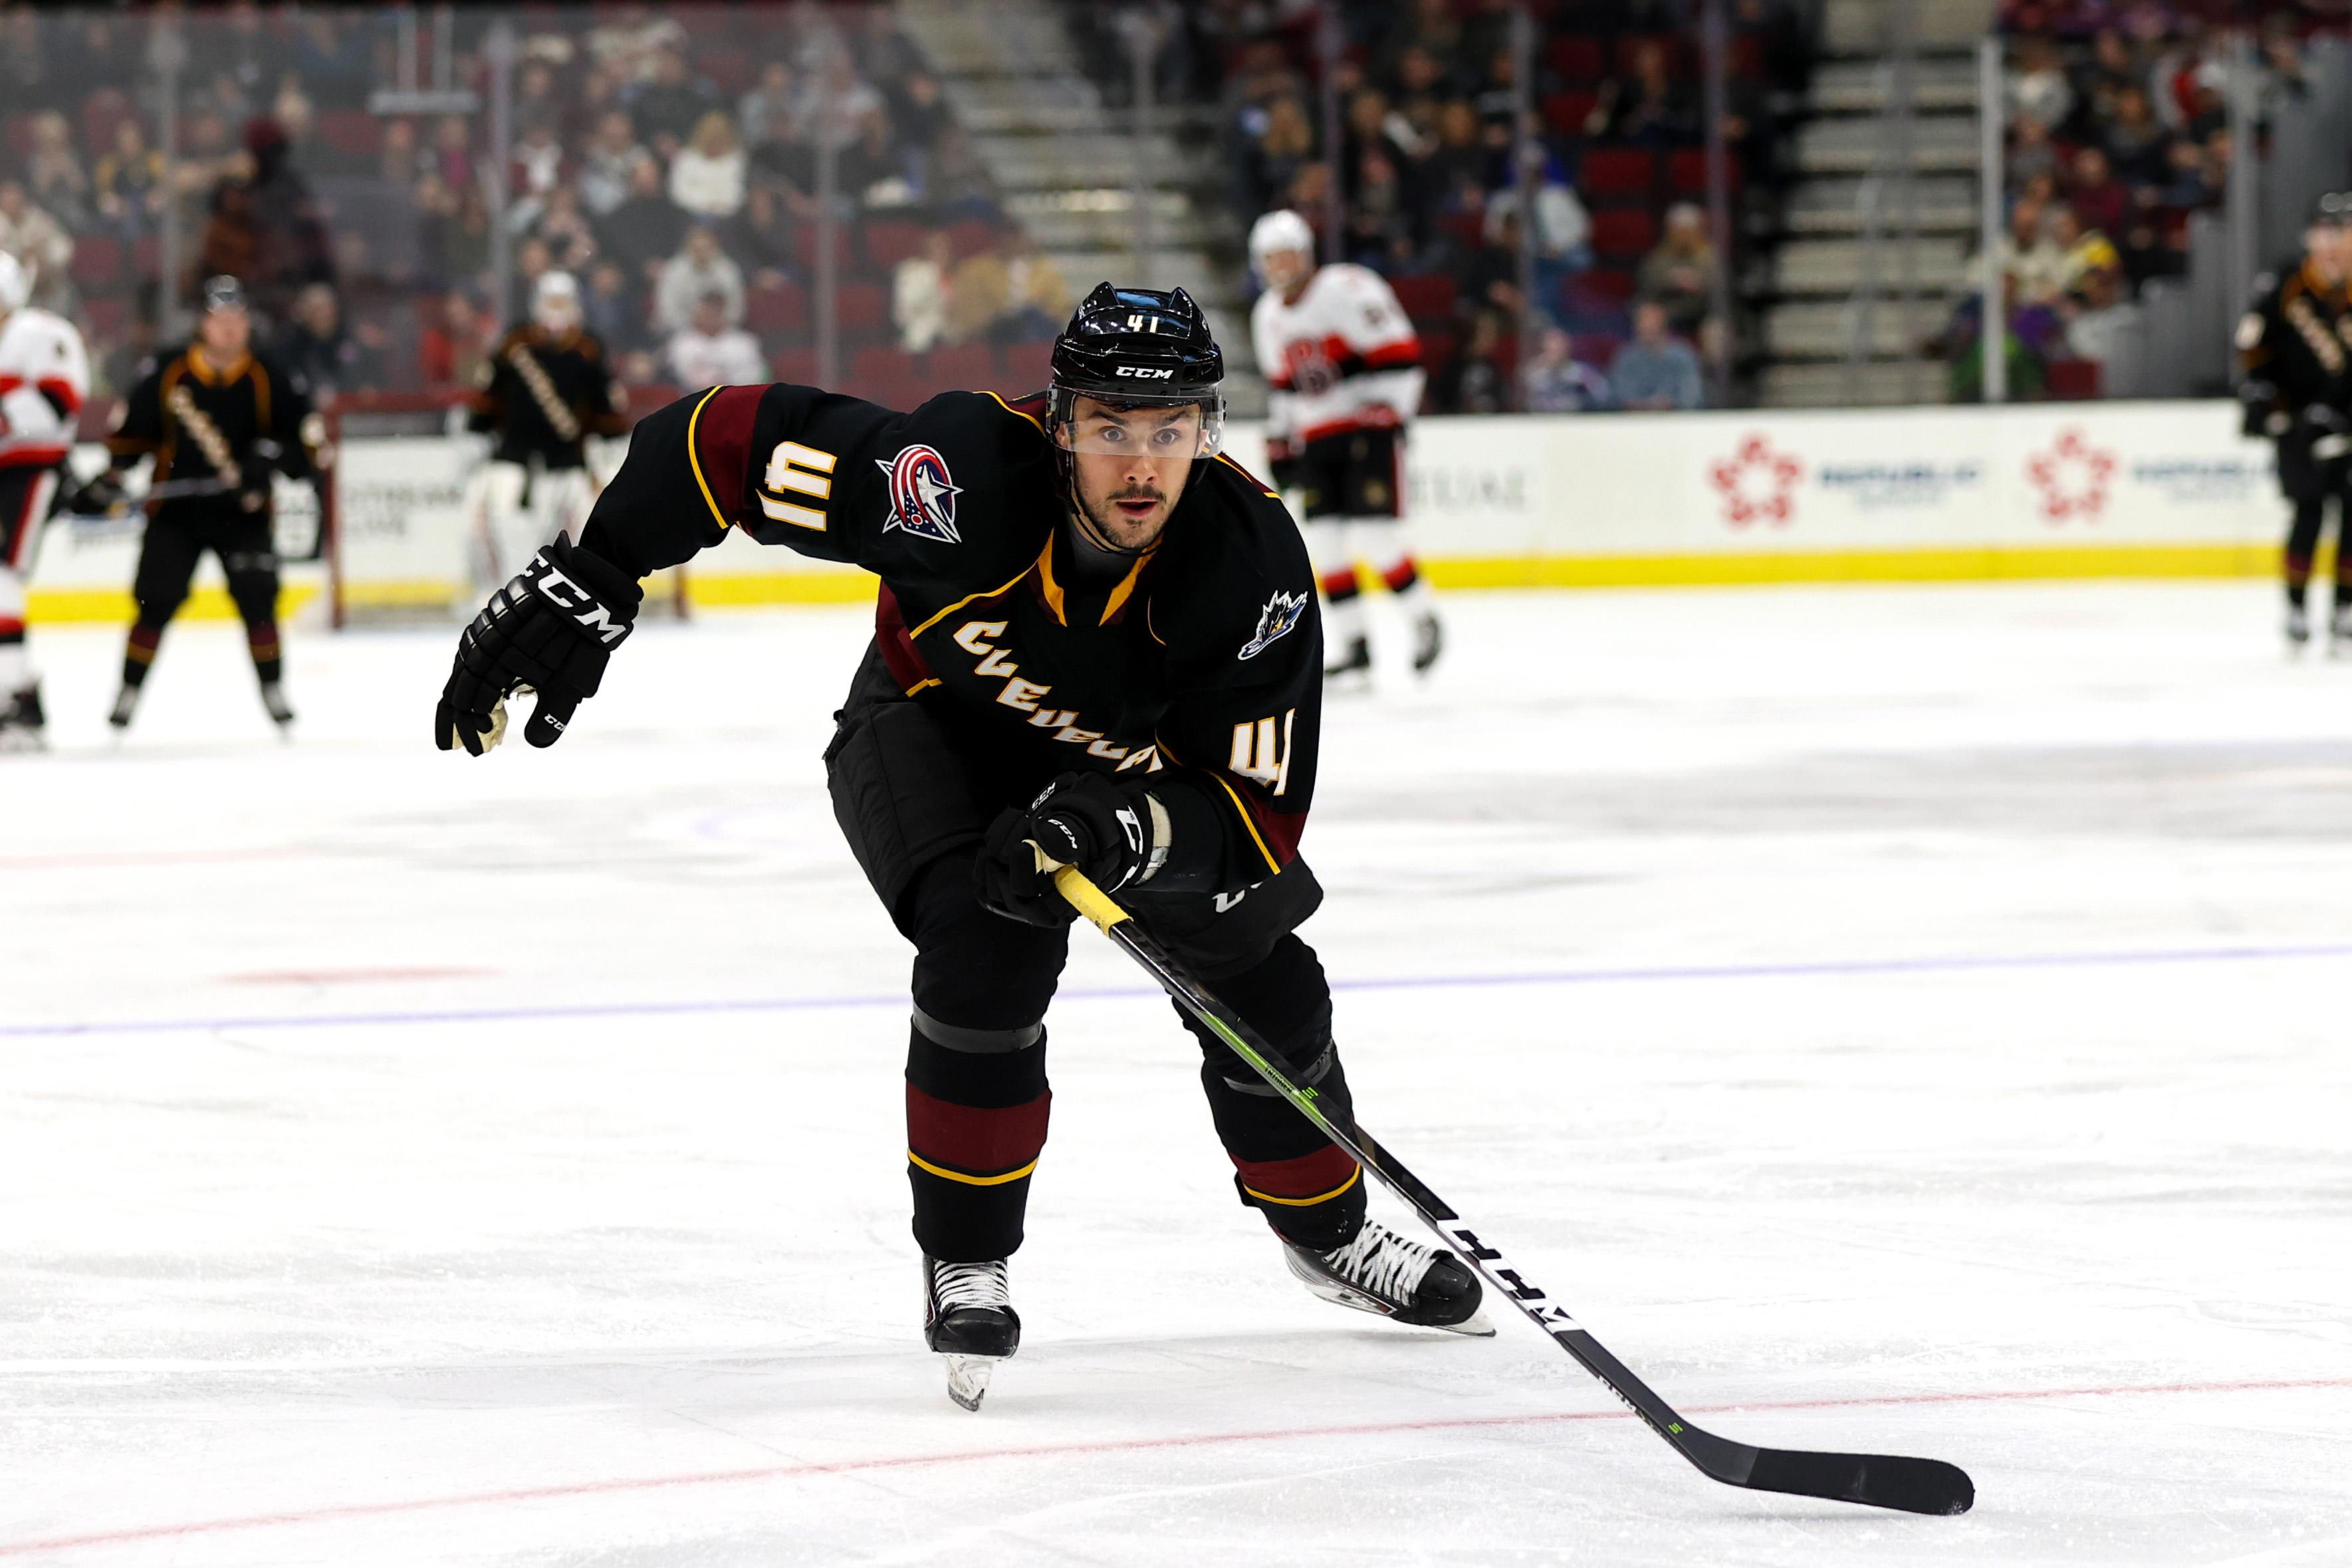 AHL: FEB 29 Belleville Senators at Cleveland Monsters